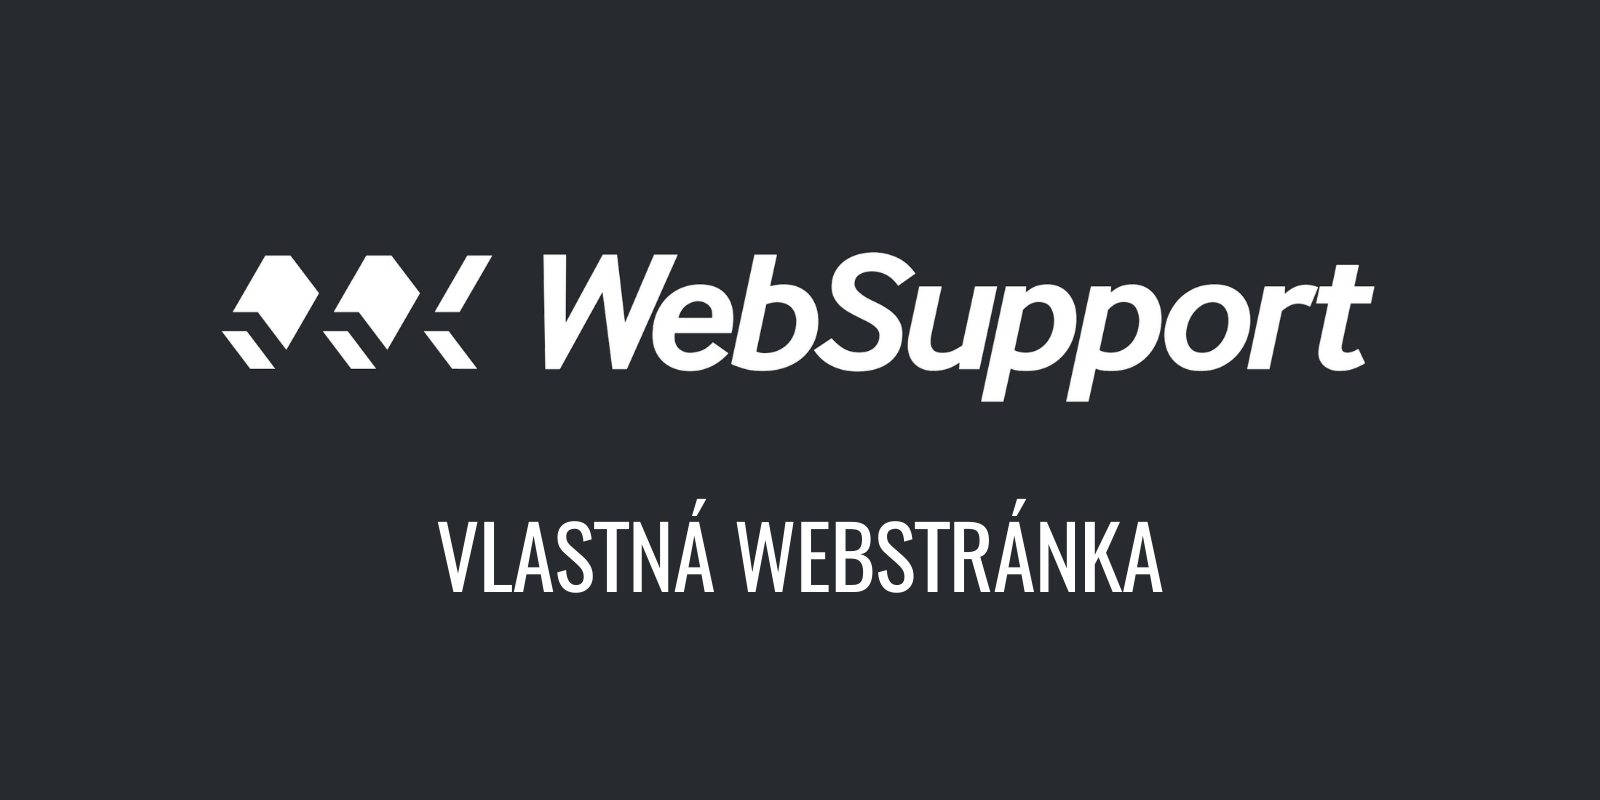 Vlastná webstránka od WebSupport - recenzia + návod